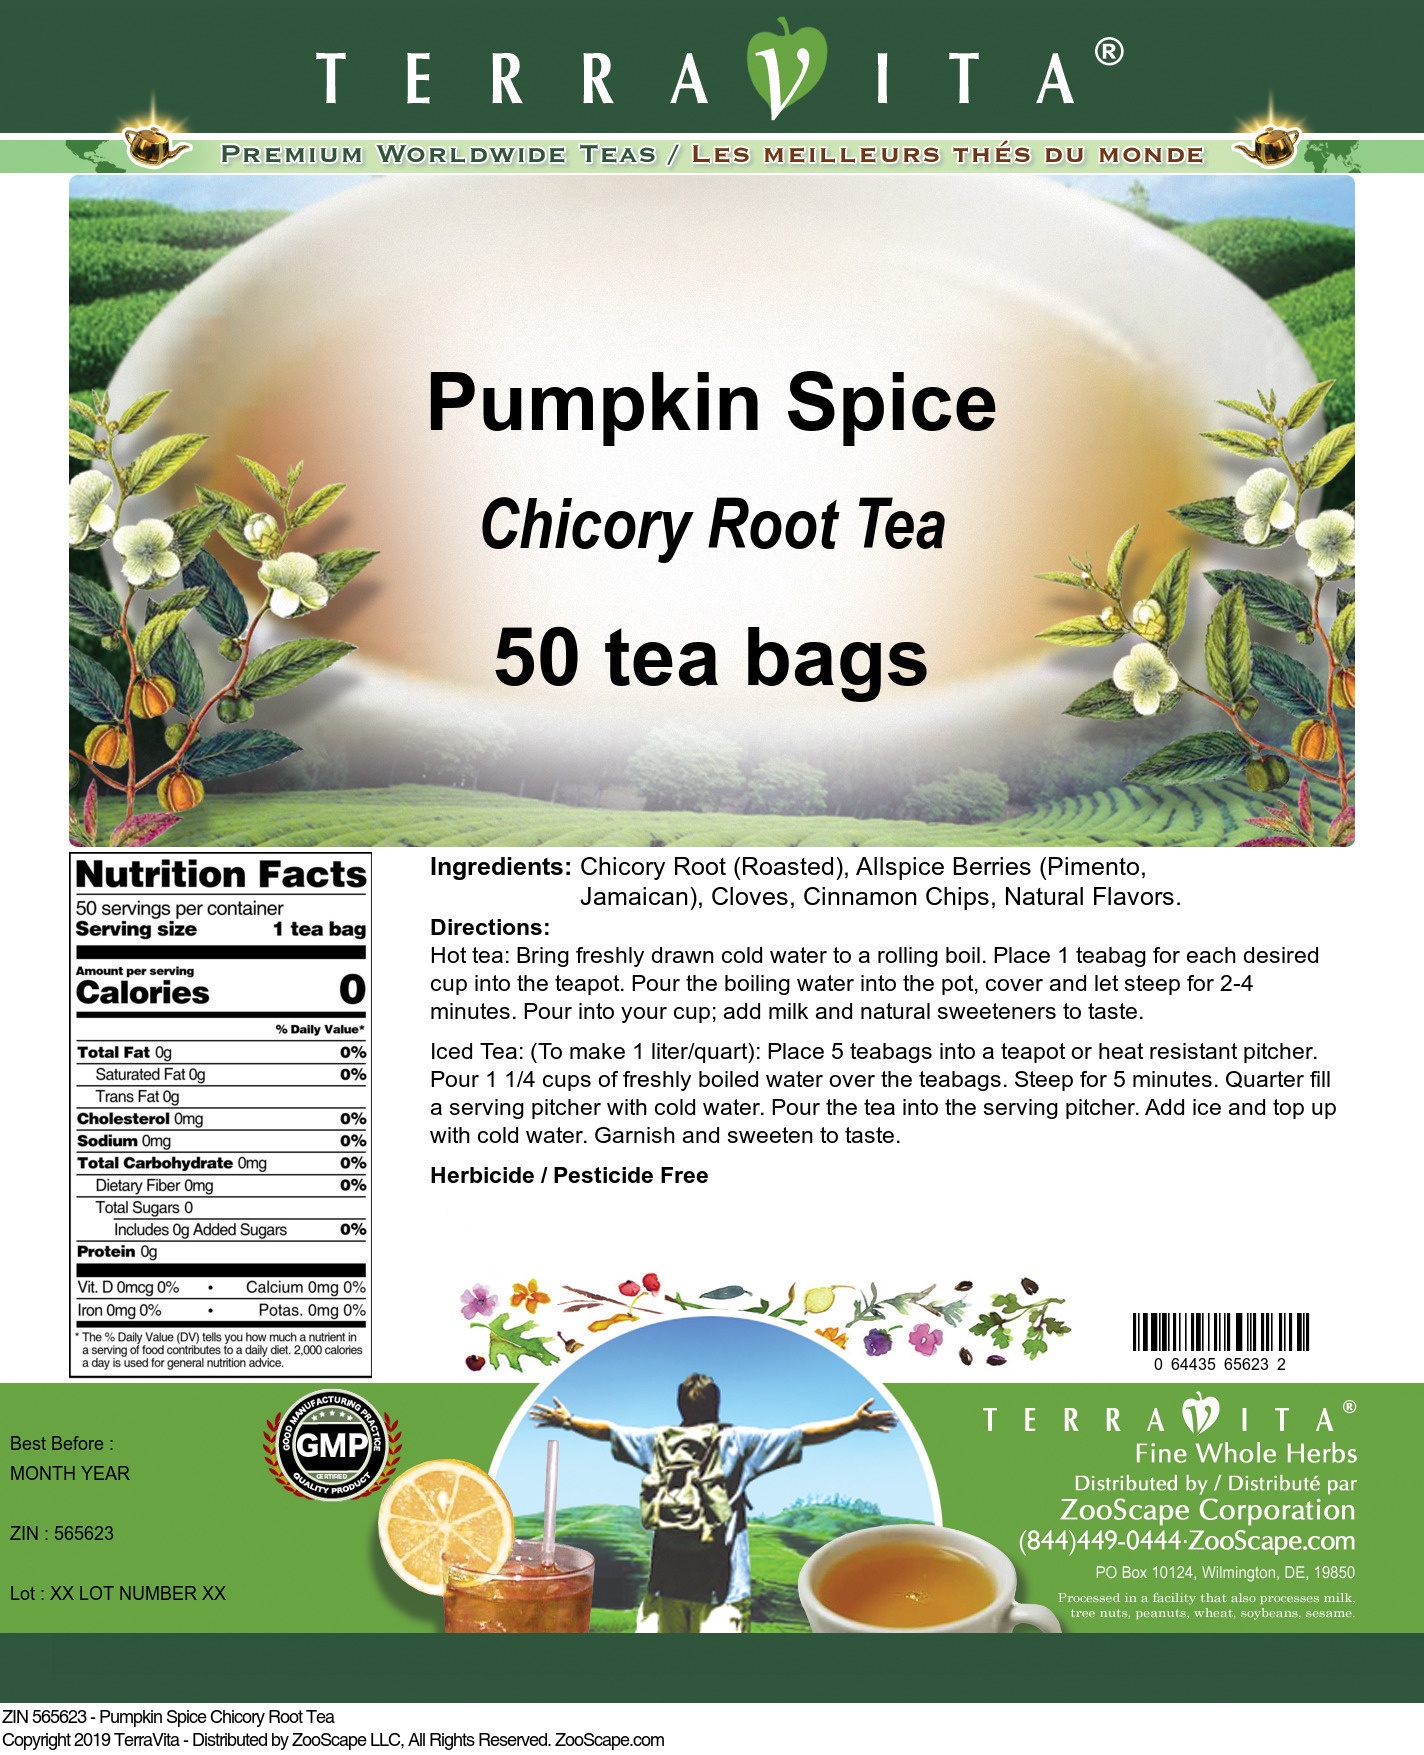 Pumpkin Spice Chicory Root Tea